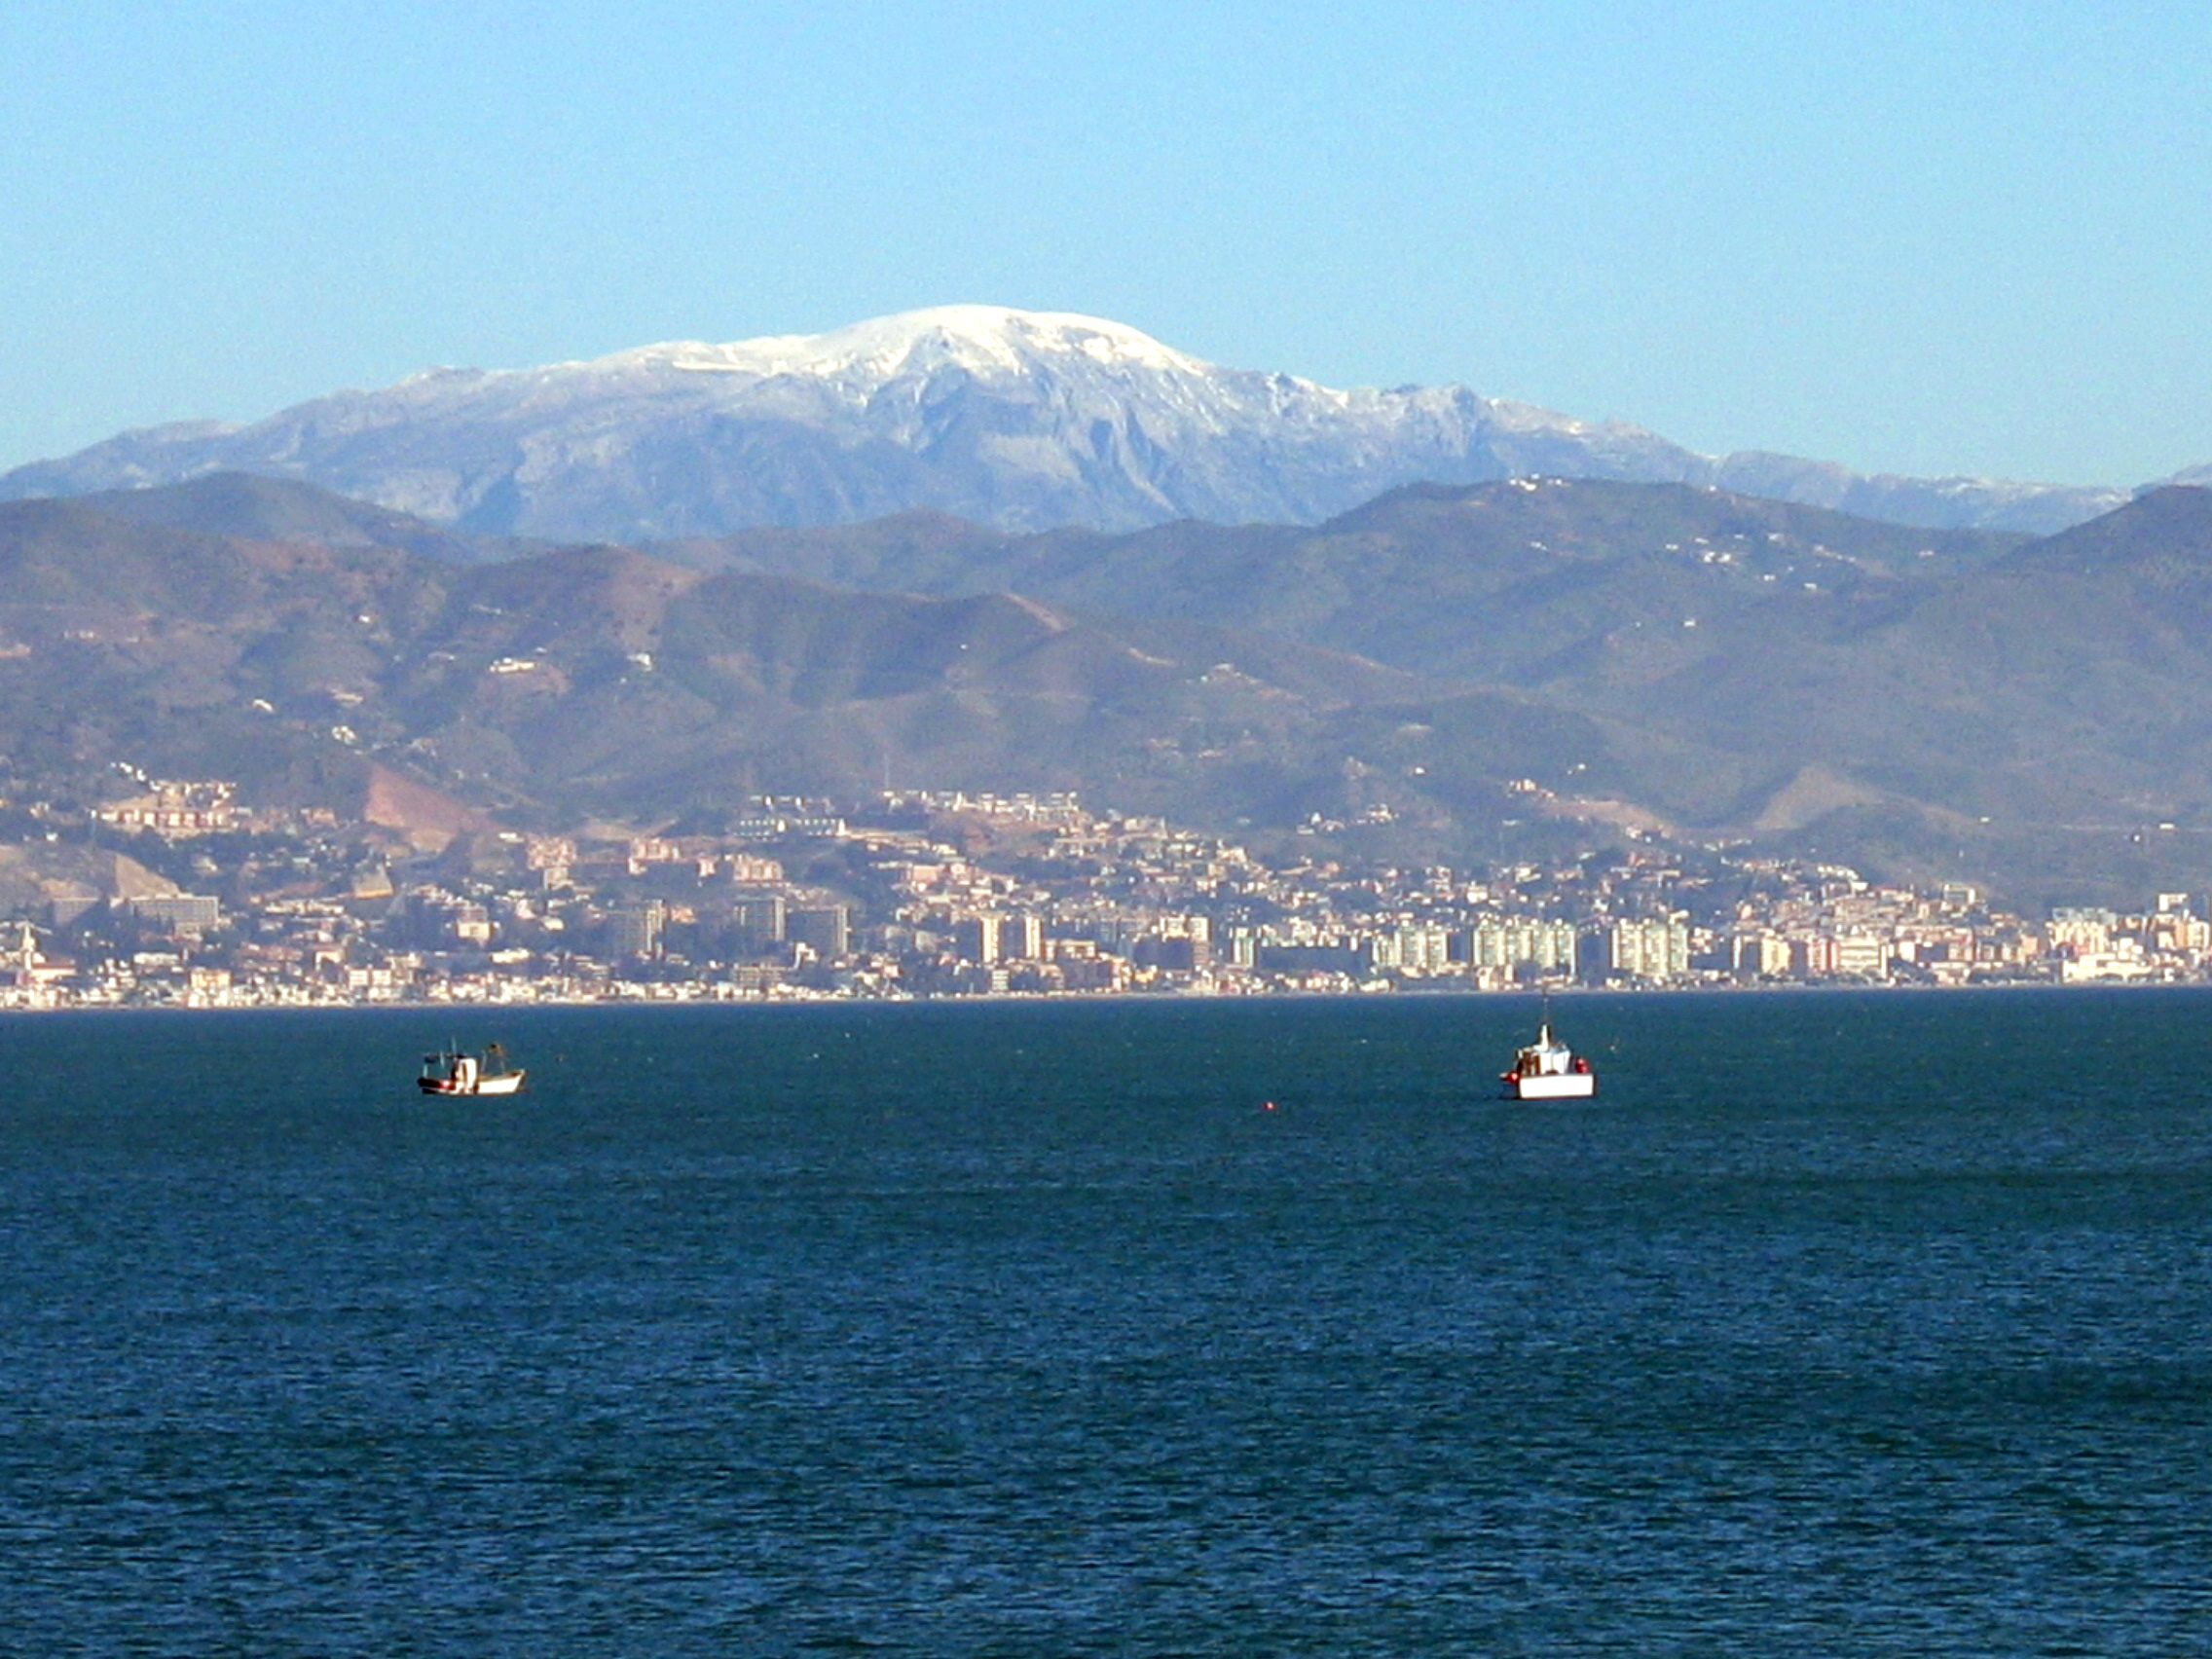 Foto playa Guadalhorce. La Maroma nevada, a sus pies Málaga